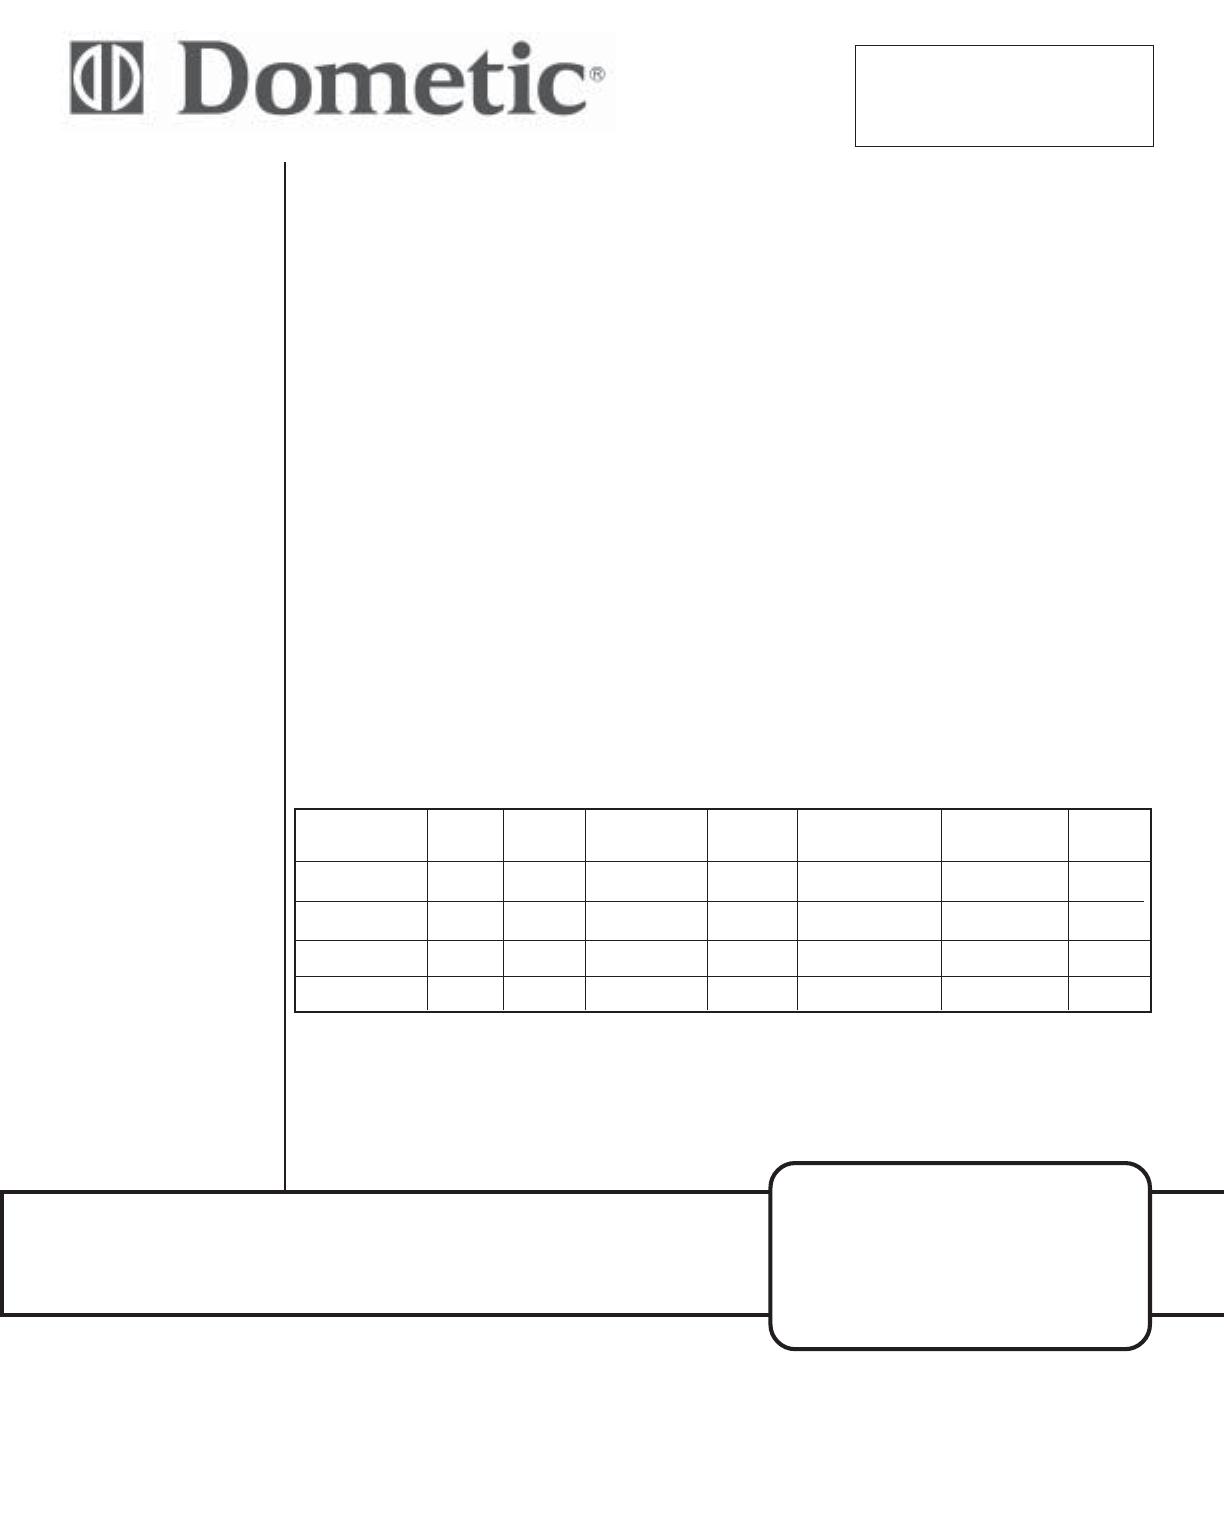 dometic rm2193 wiring diagram rj45 wall jack 9 16 04 refrigerator parts list 1